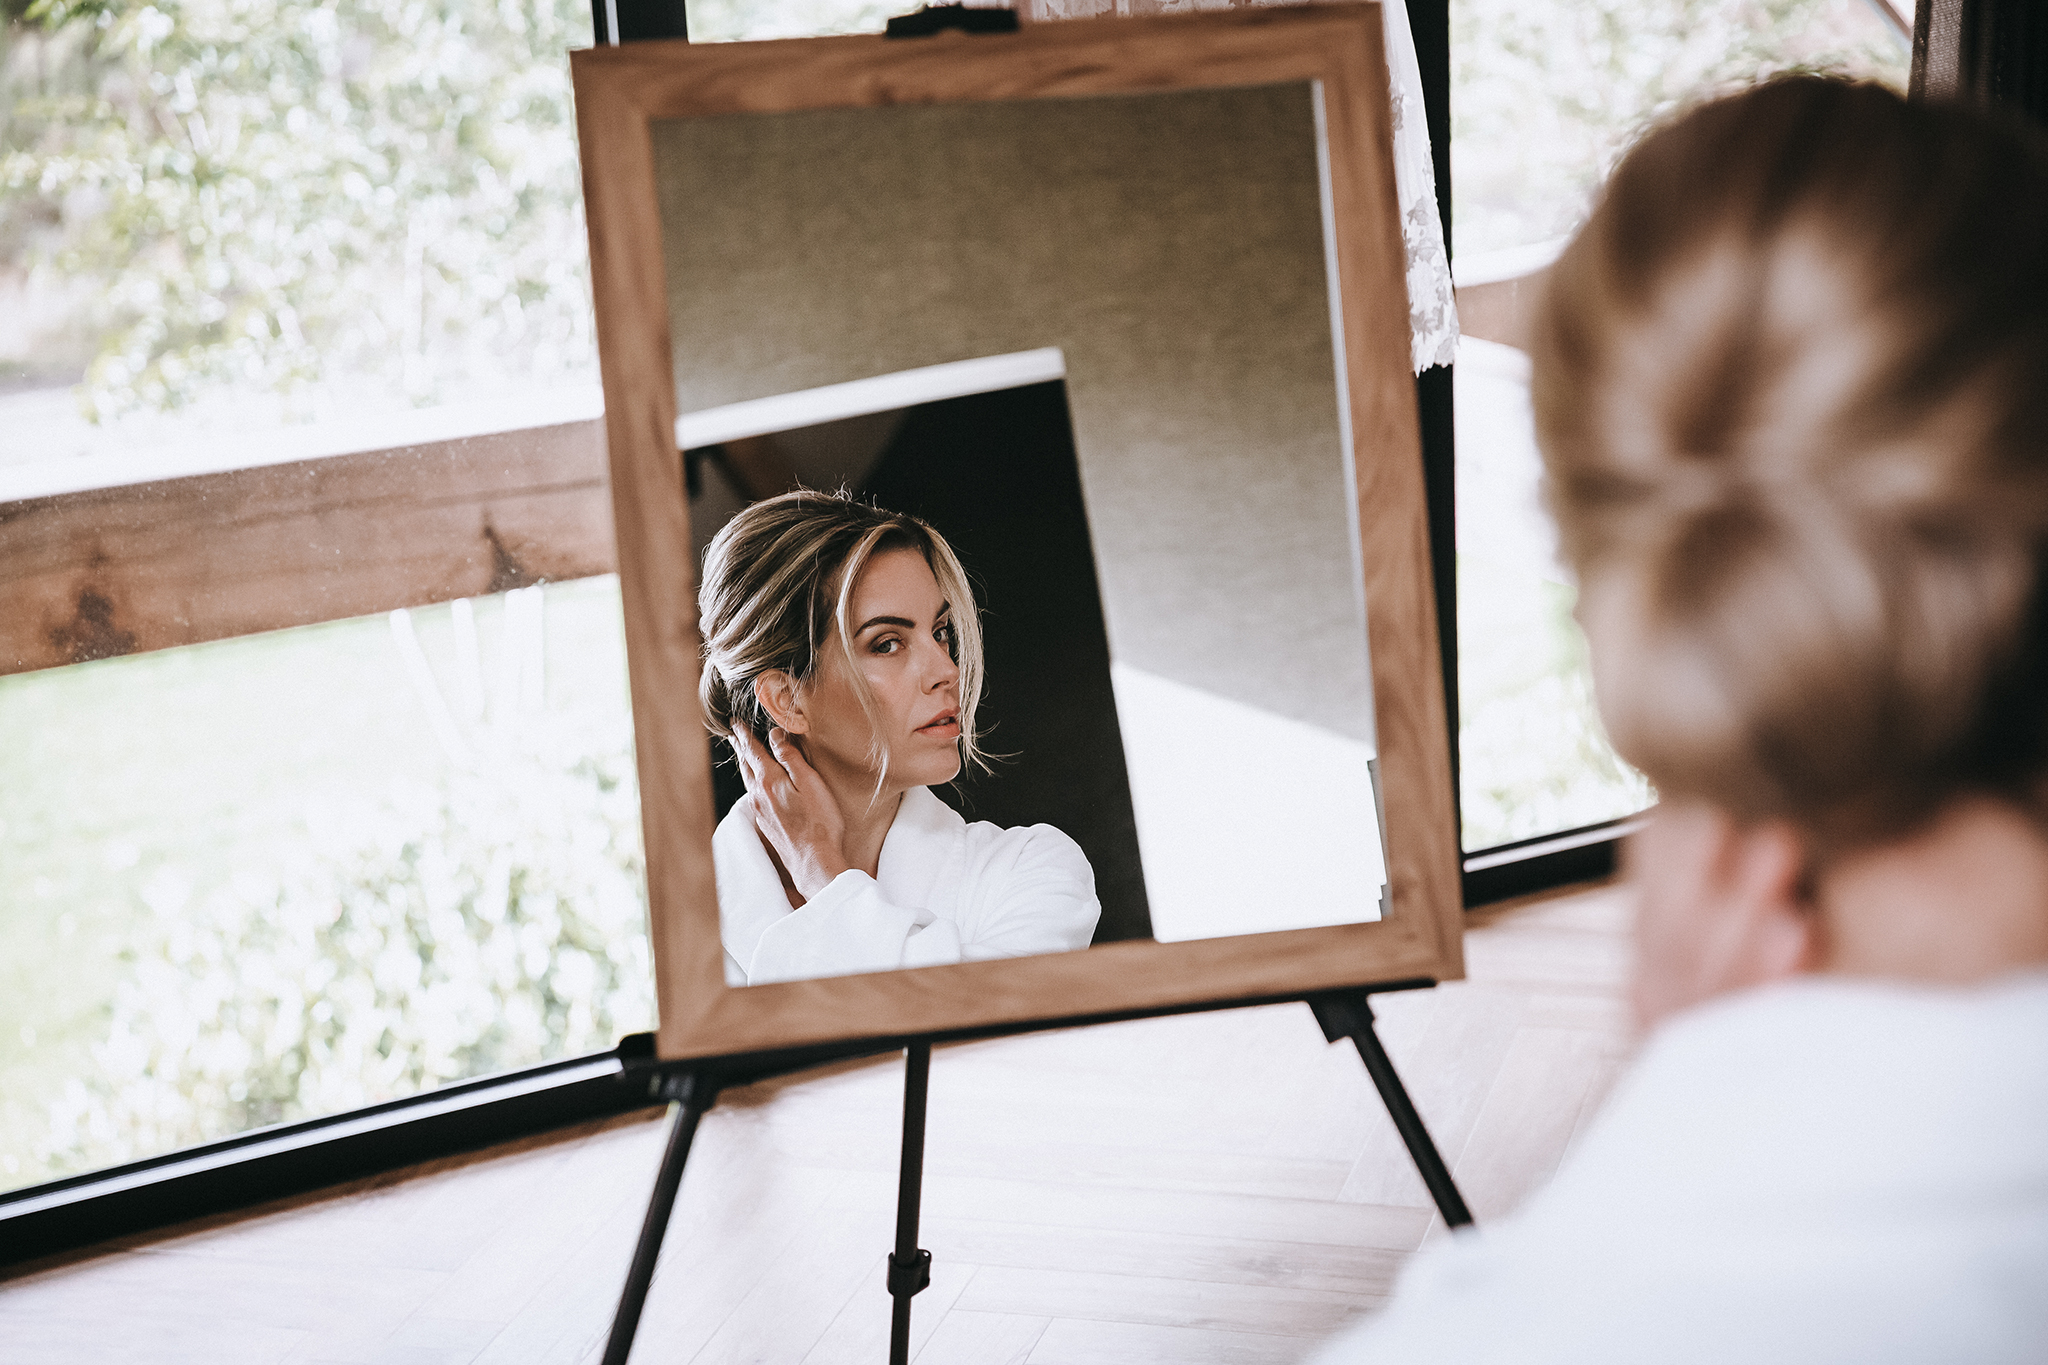 Bruidsfotograaf Kim Vos Fotografie Nuenen Bruidsfotografie love trouwens